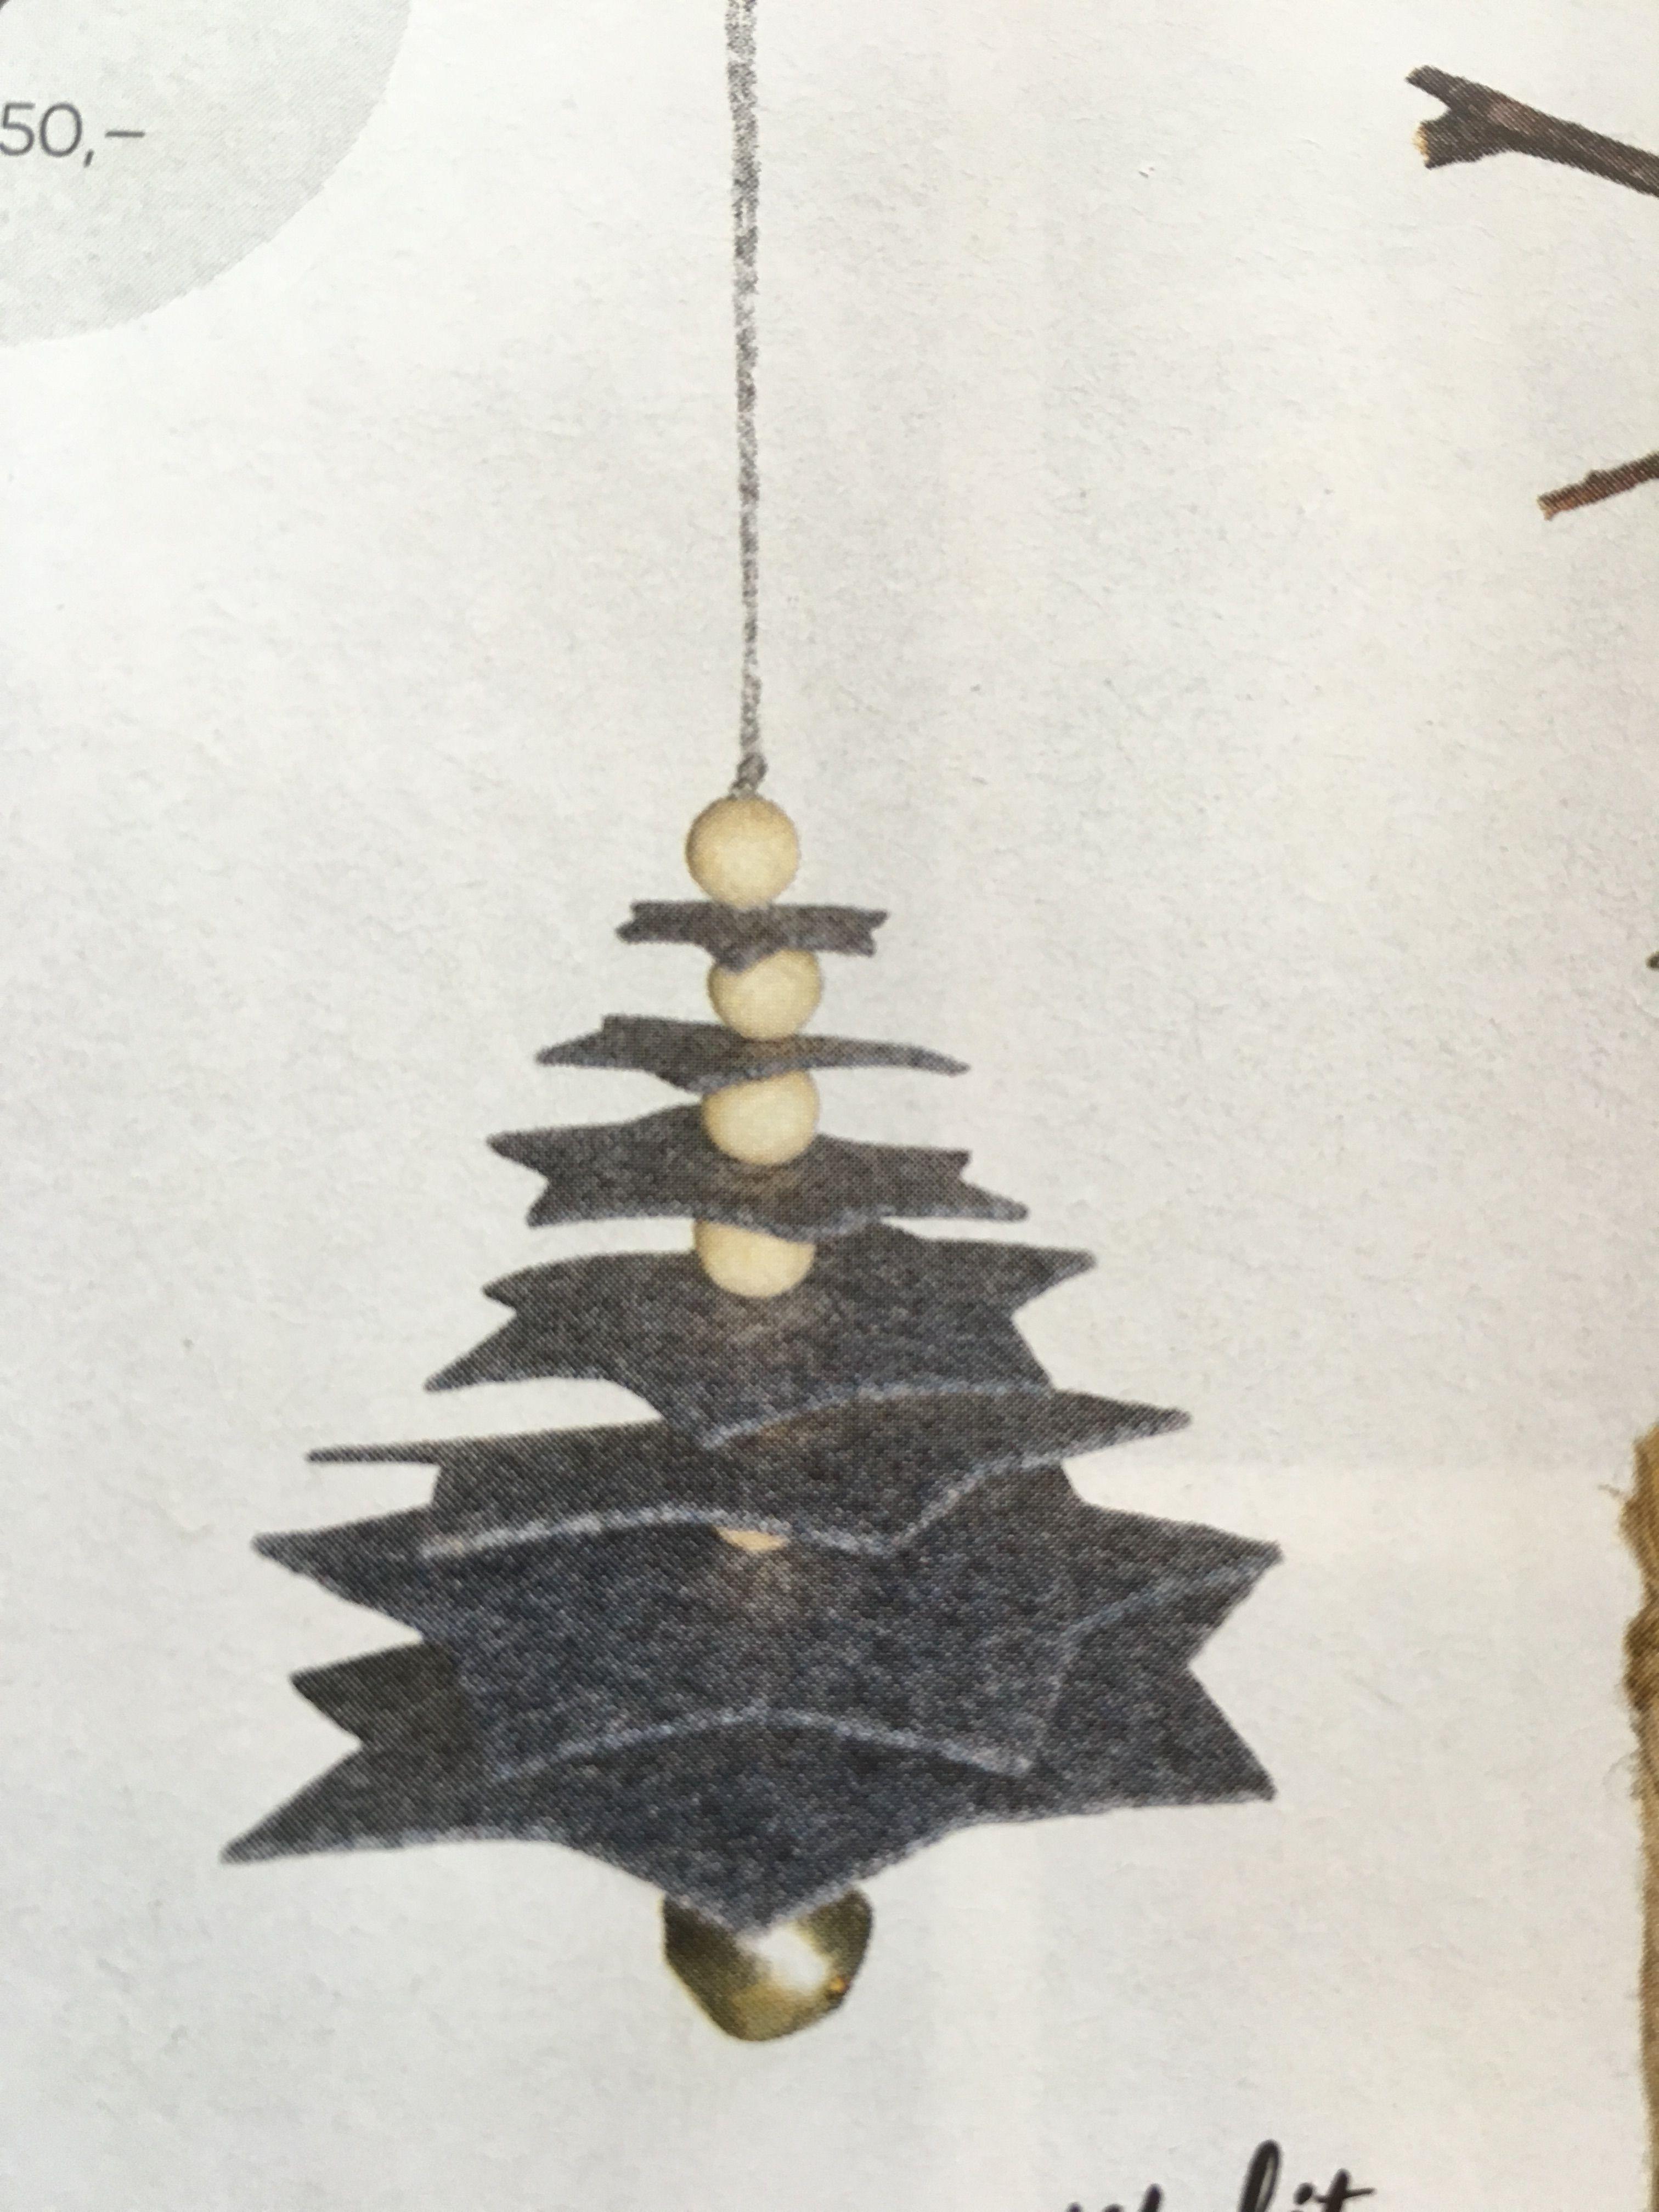 holiday crafting ideas